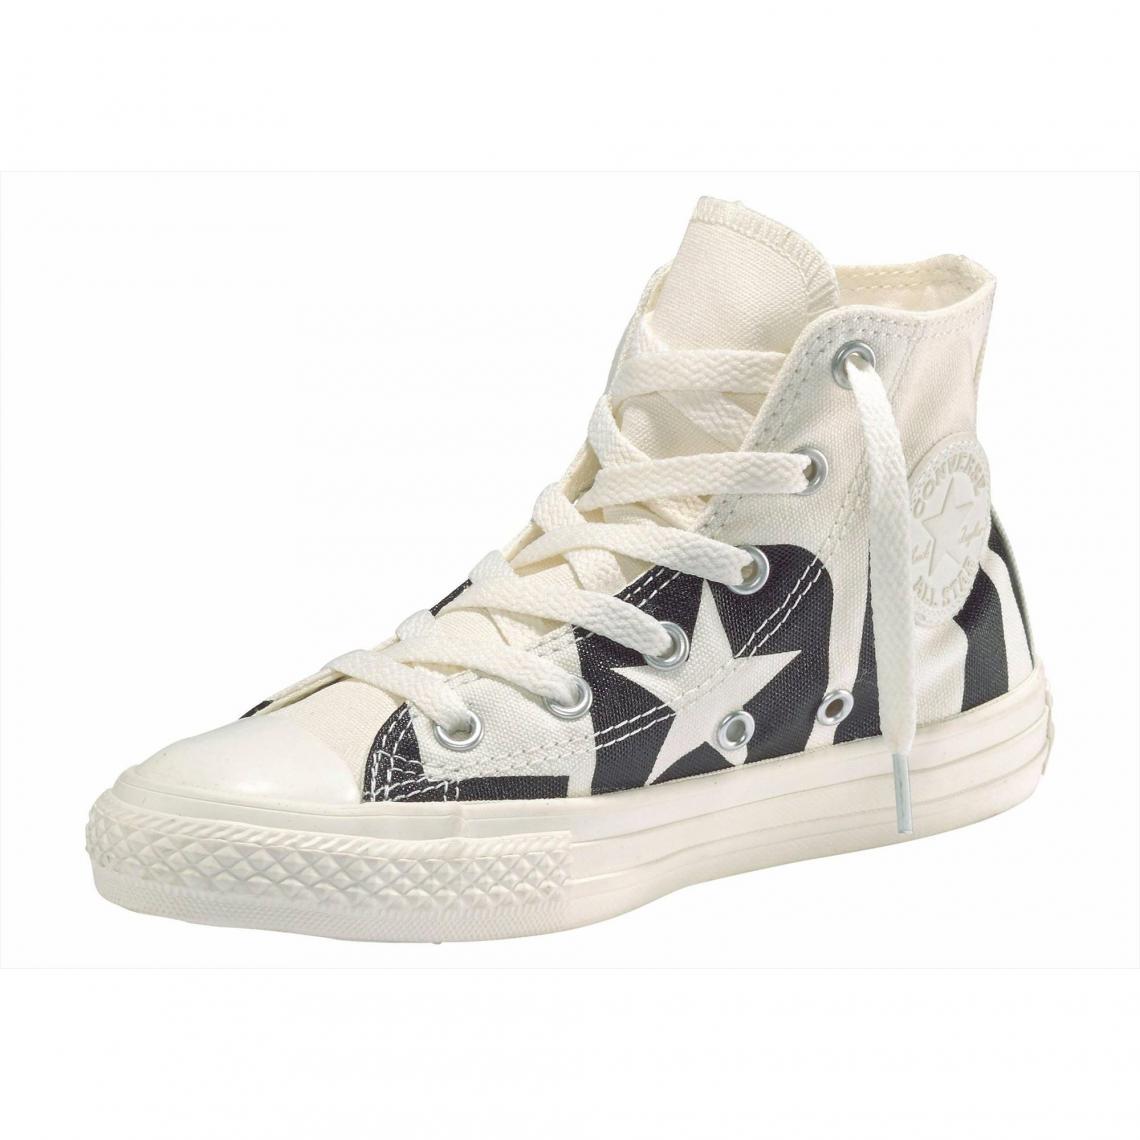 77bda2f4002 Baskets montantes imprimées junior Converse Chuck Taylor All Star Hi Youth  - Blanc - Noir Converse